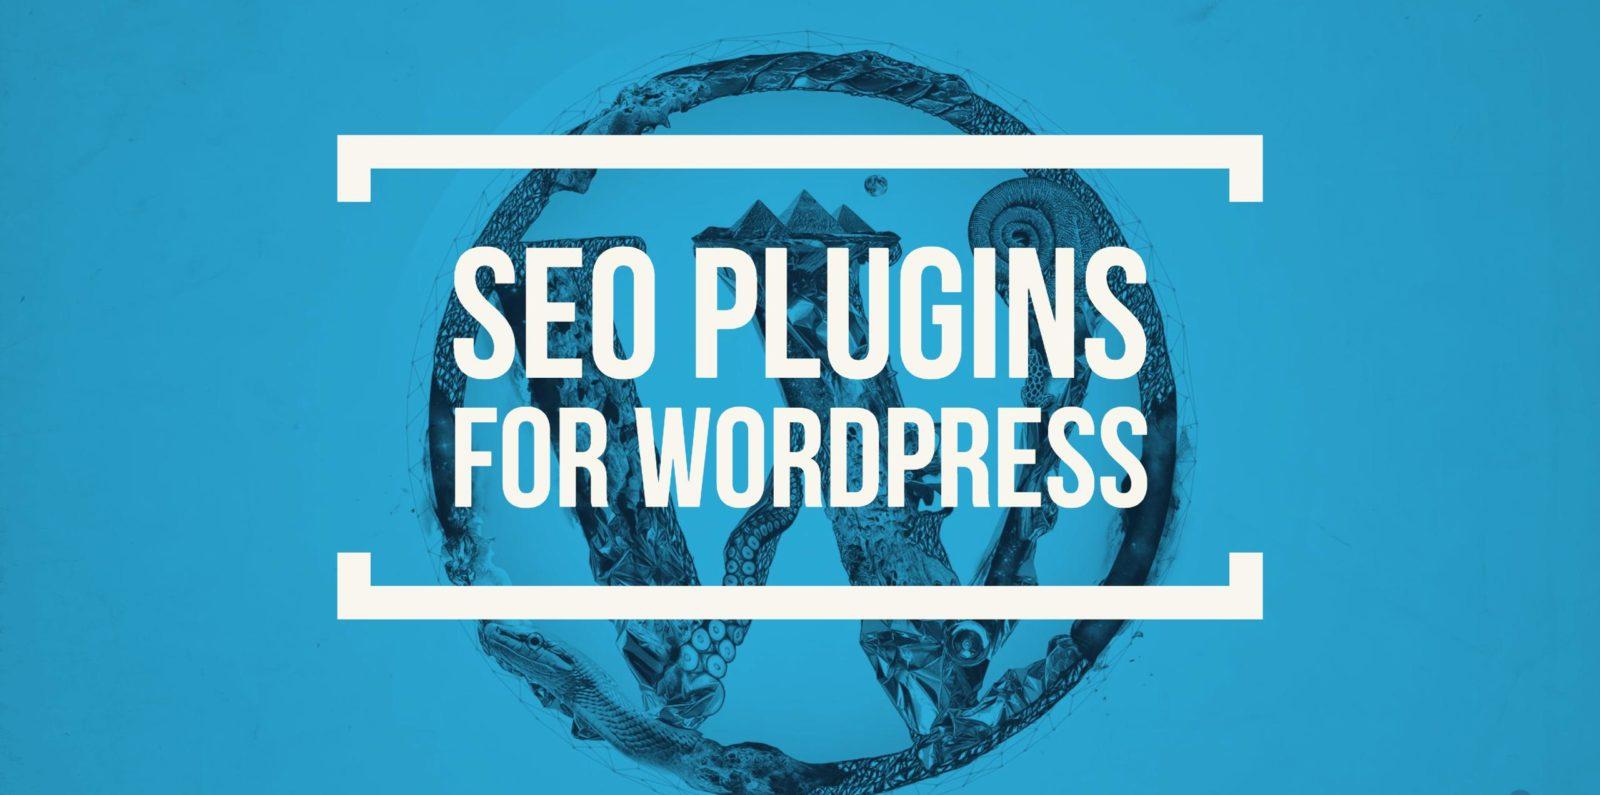 cropped-SEO-Plugins-for-WordPress.jpg